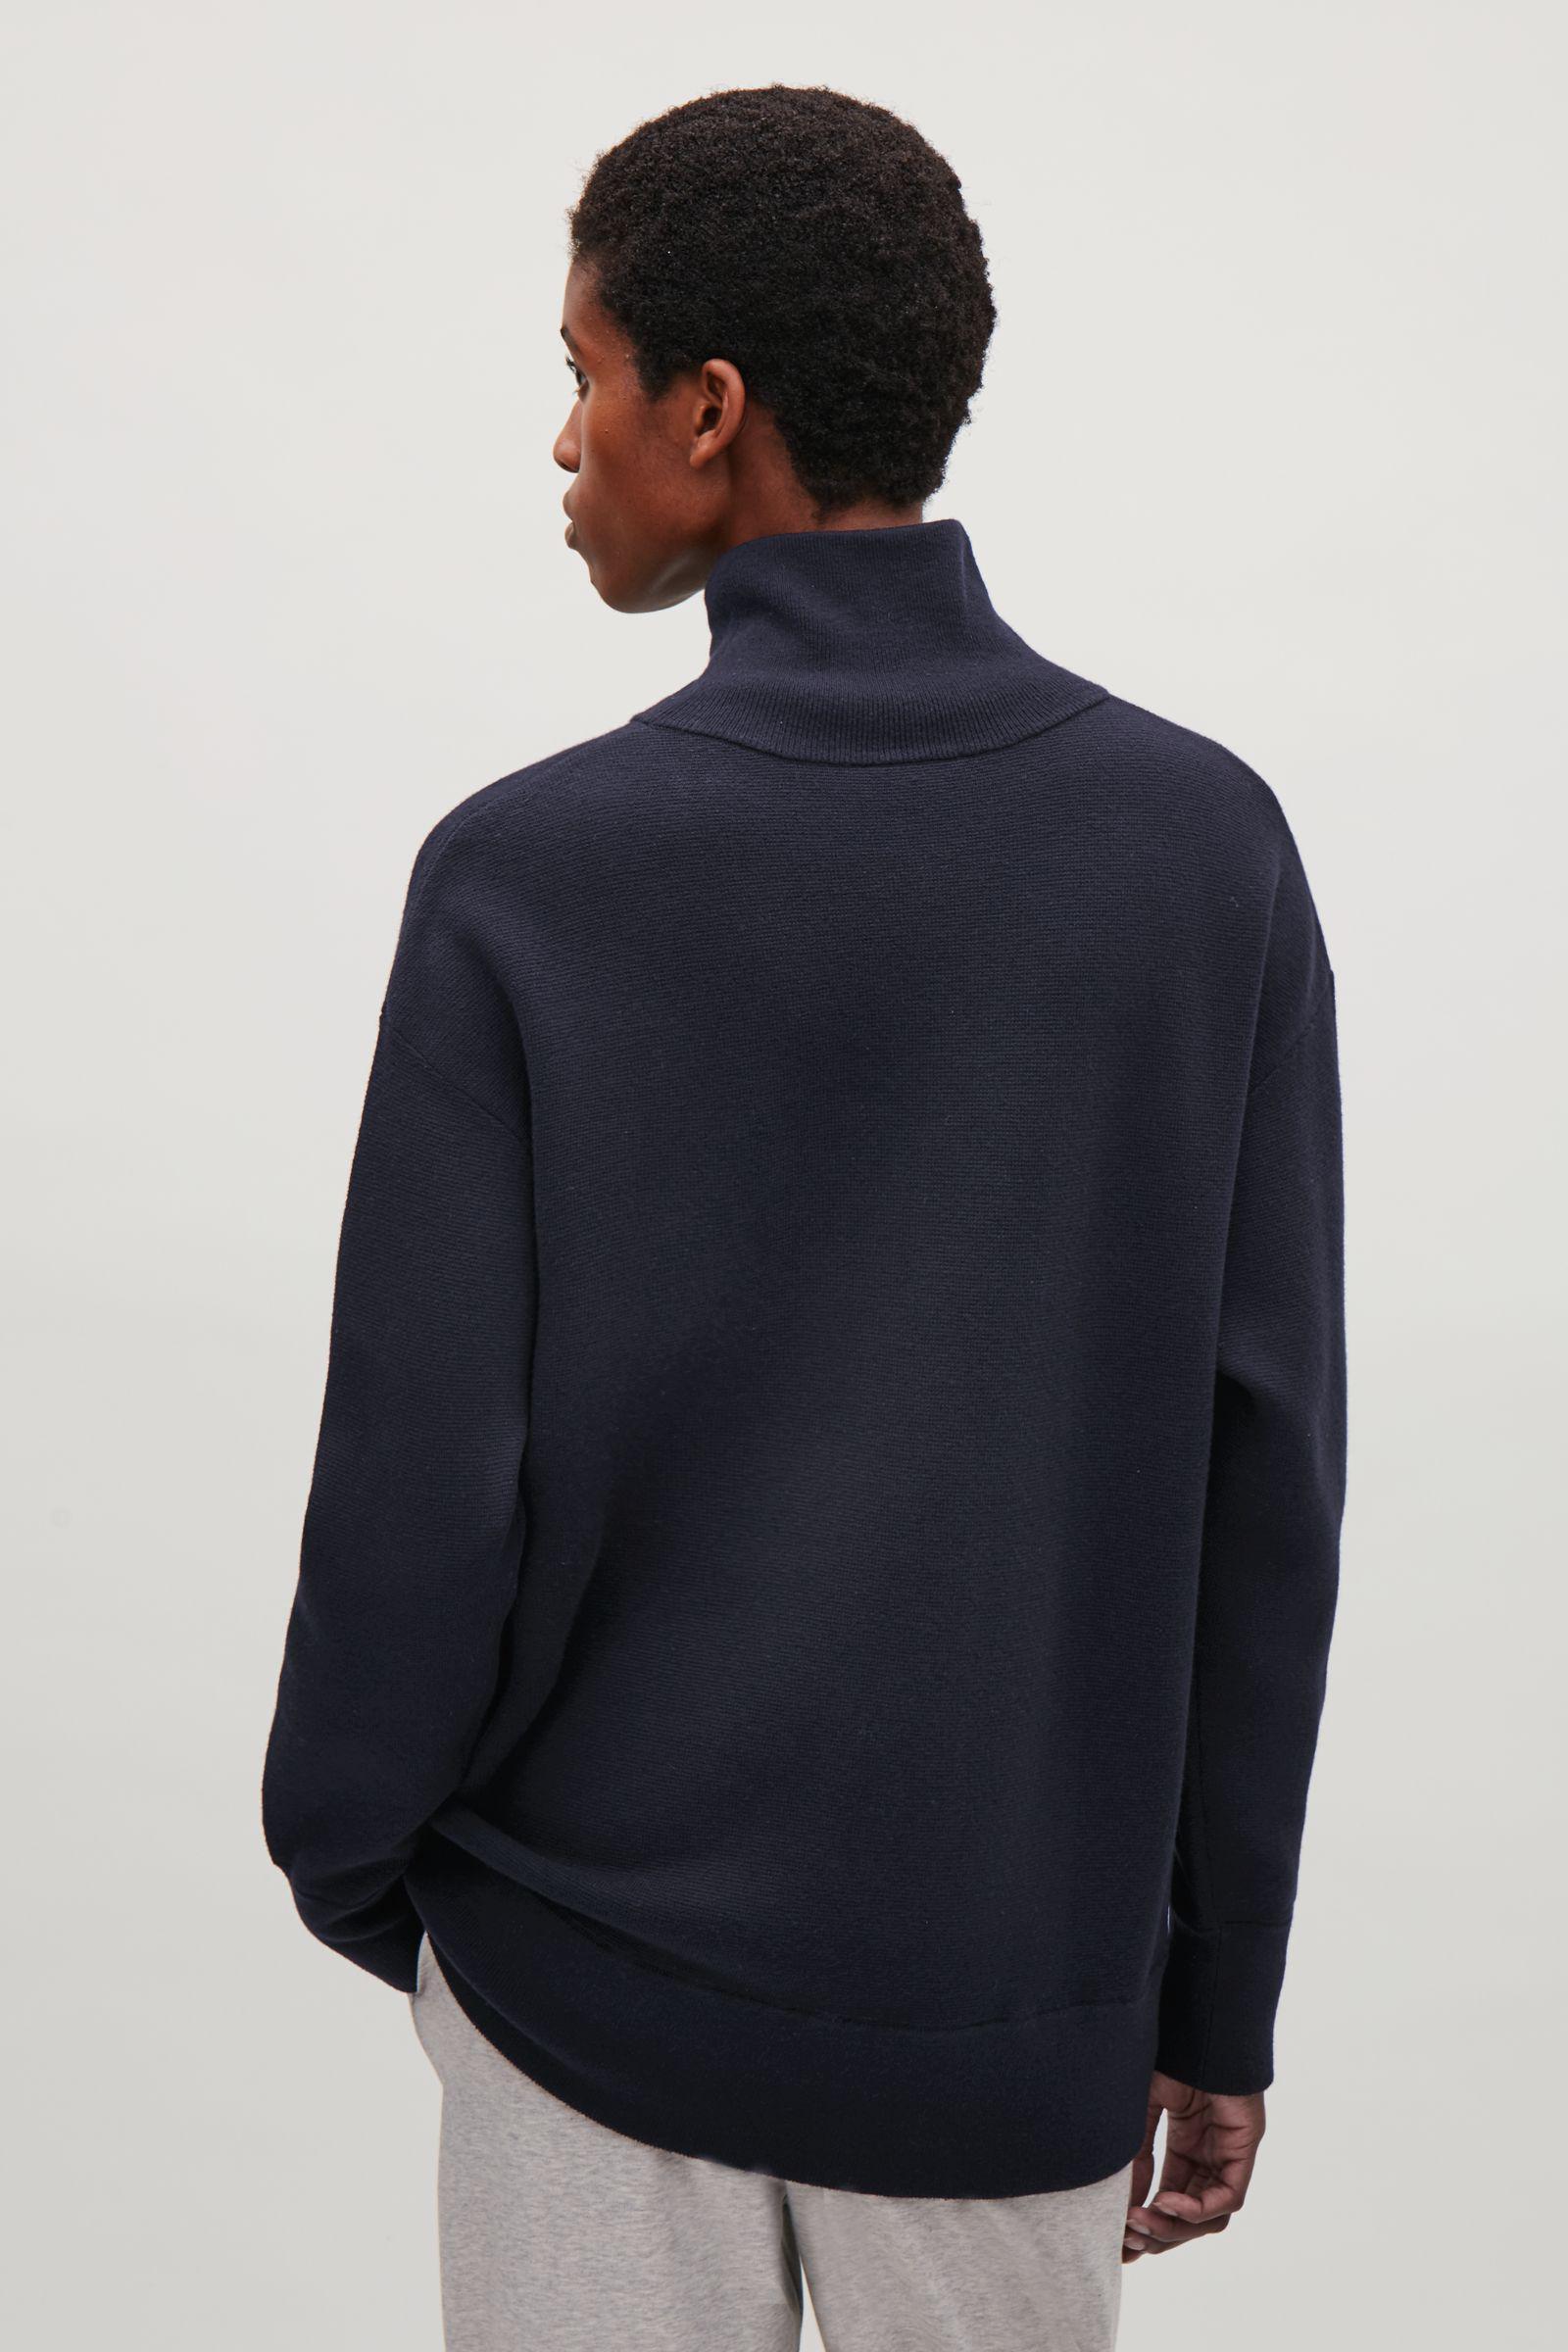 607e3f480 Lyst - COS Oversized Milano Knit Jumper in Blue